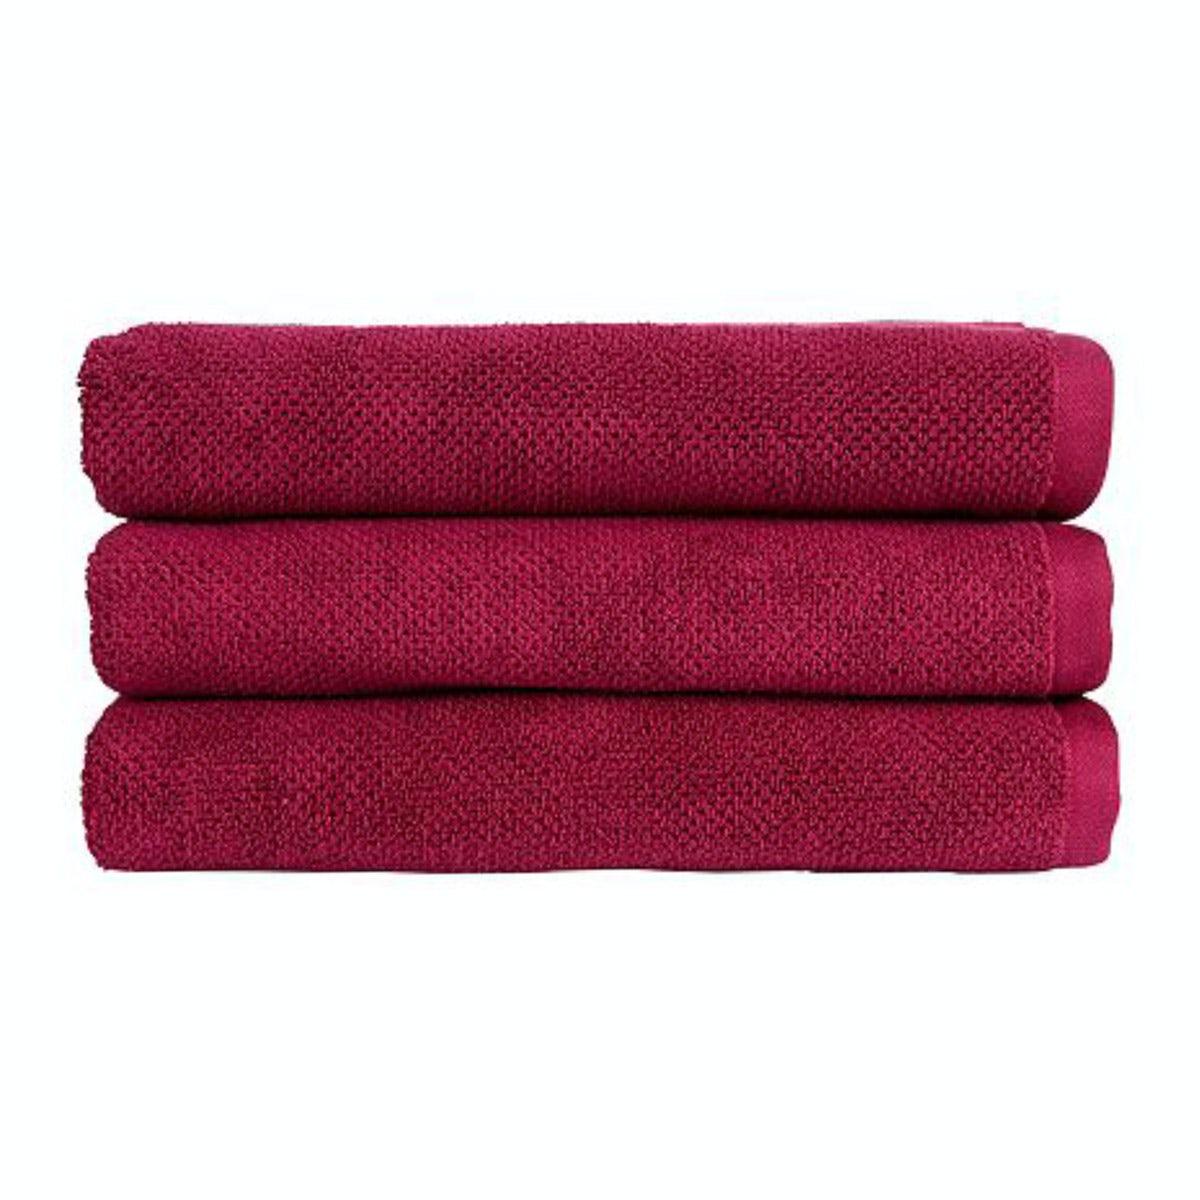 Christy Brixton magenta bath towel